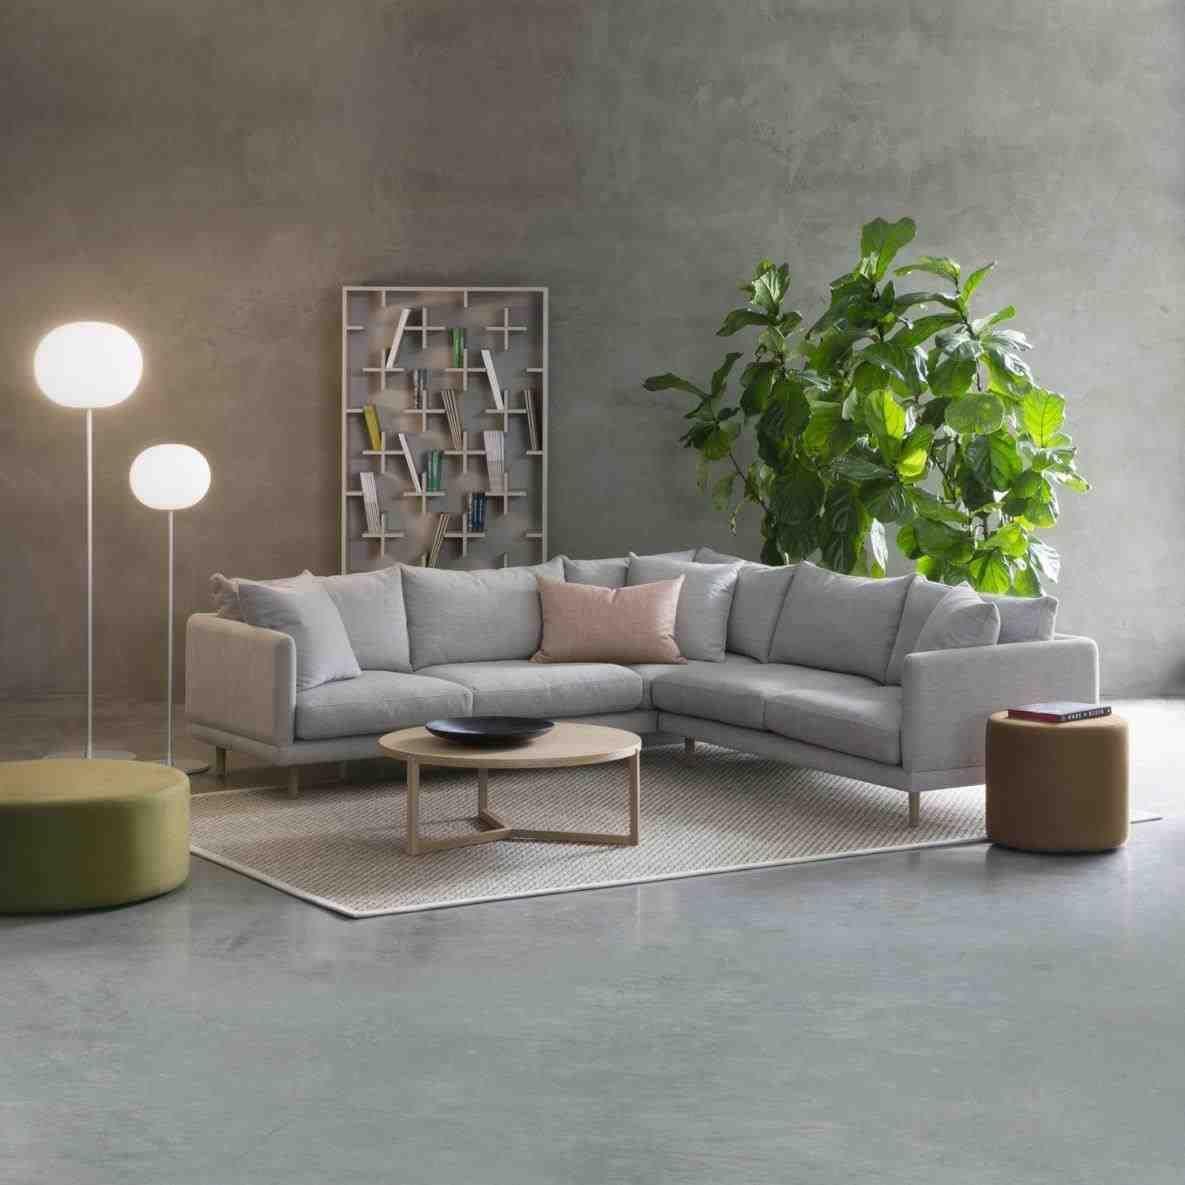 Cheap Sofa In Sydney Sofas Sydney Full Size Of Sofa Round Sofa